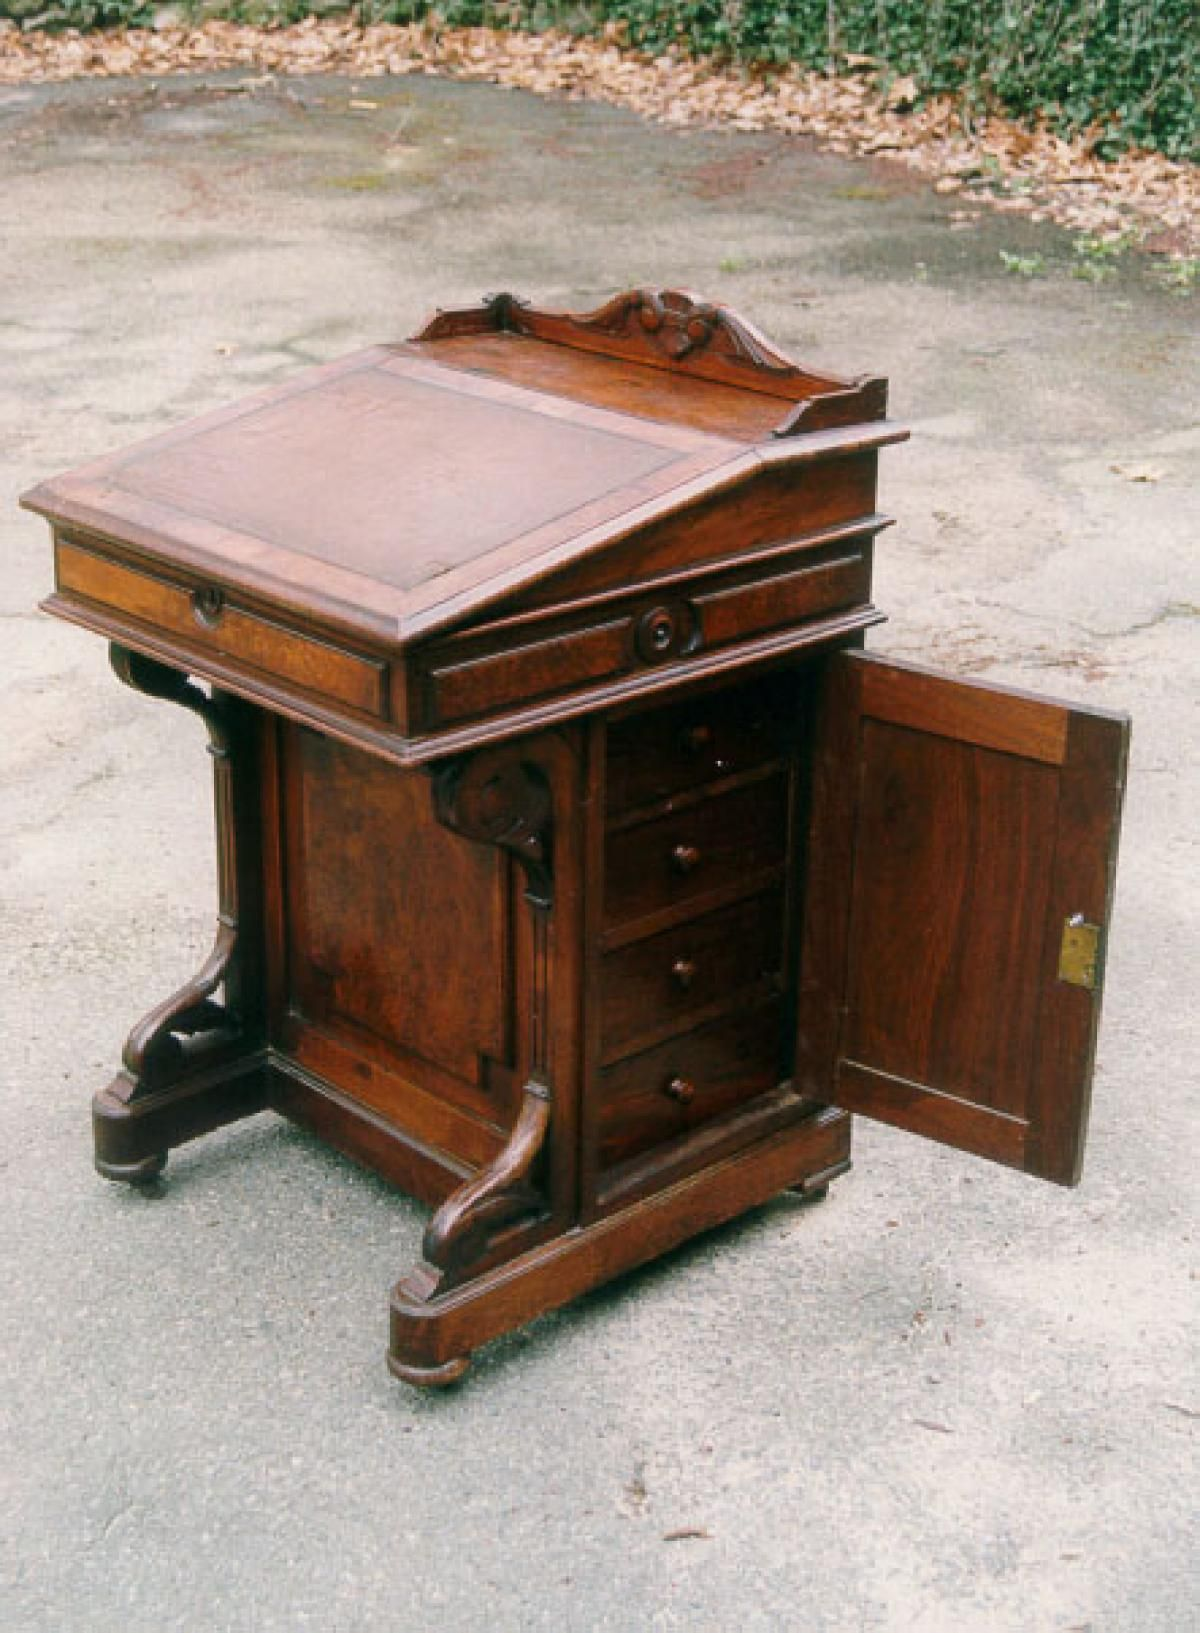 Antique American furniture Davenport Desk - Antique American Furniture Davenport Desk Antiques In 2018